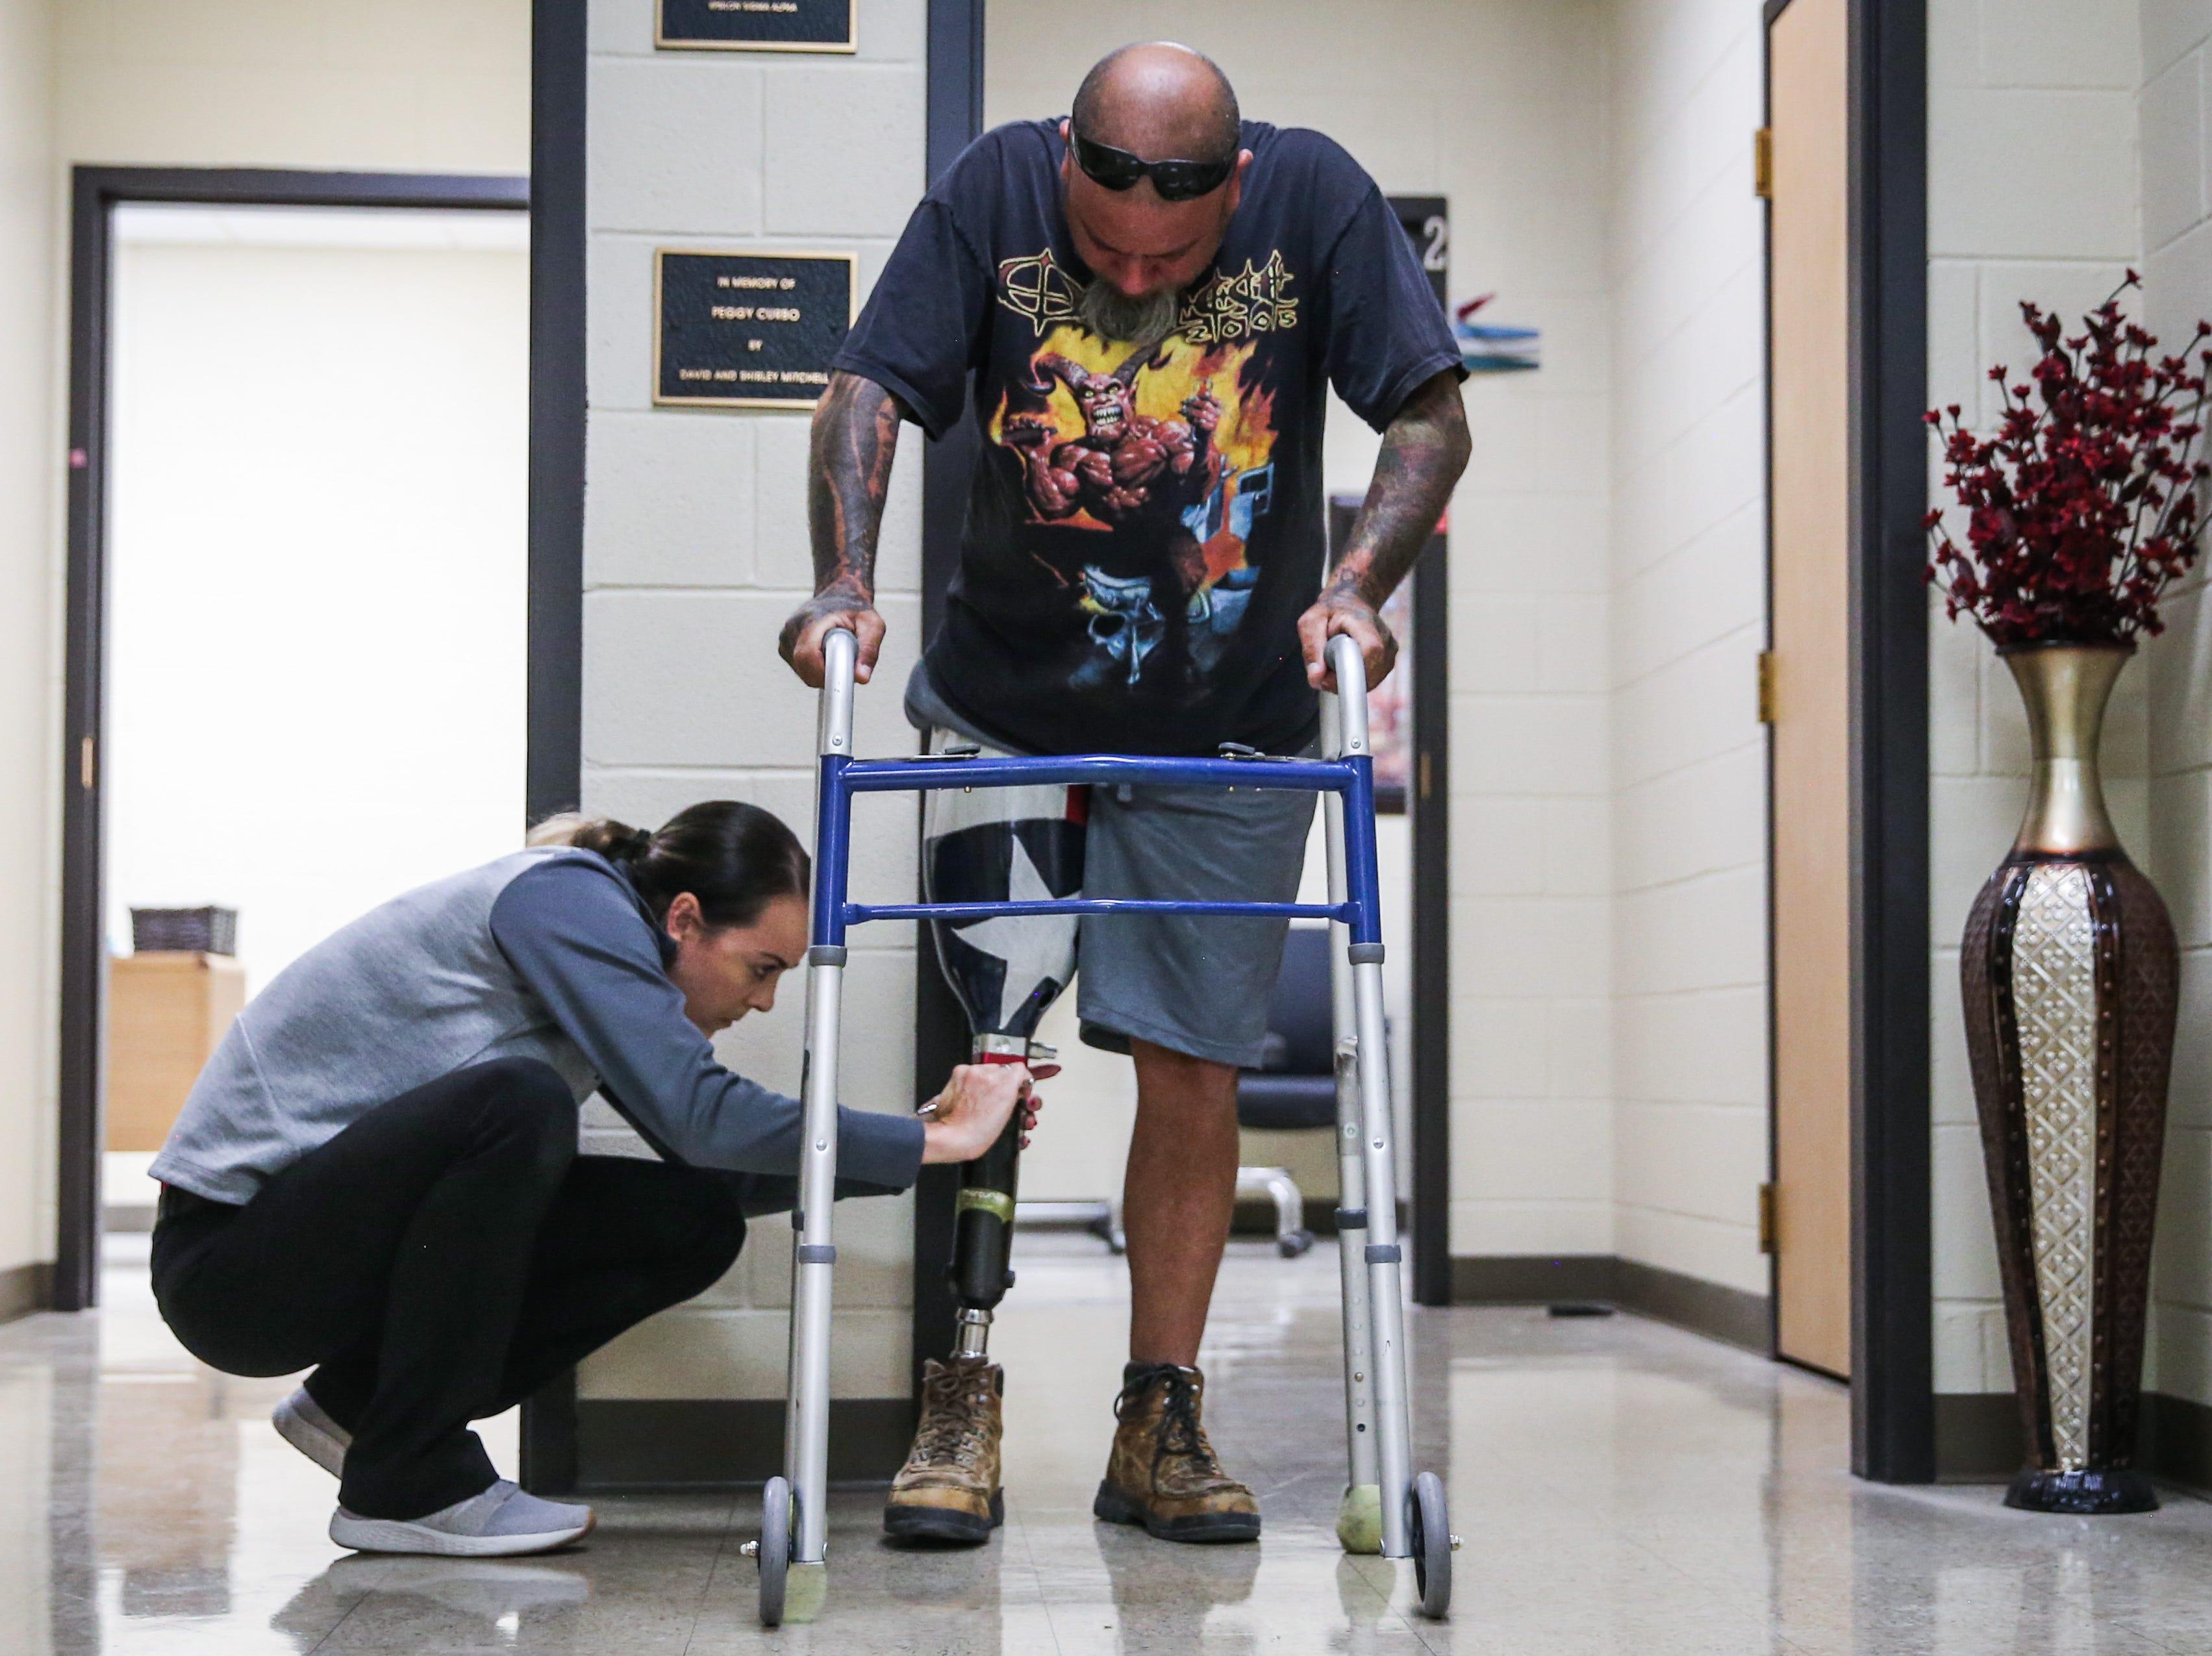 Whitney Brandon adjusts Jeremy Armenta's new prosthetic Wednesday, March 20, 2019, at West Texas Rehab.